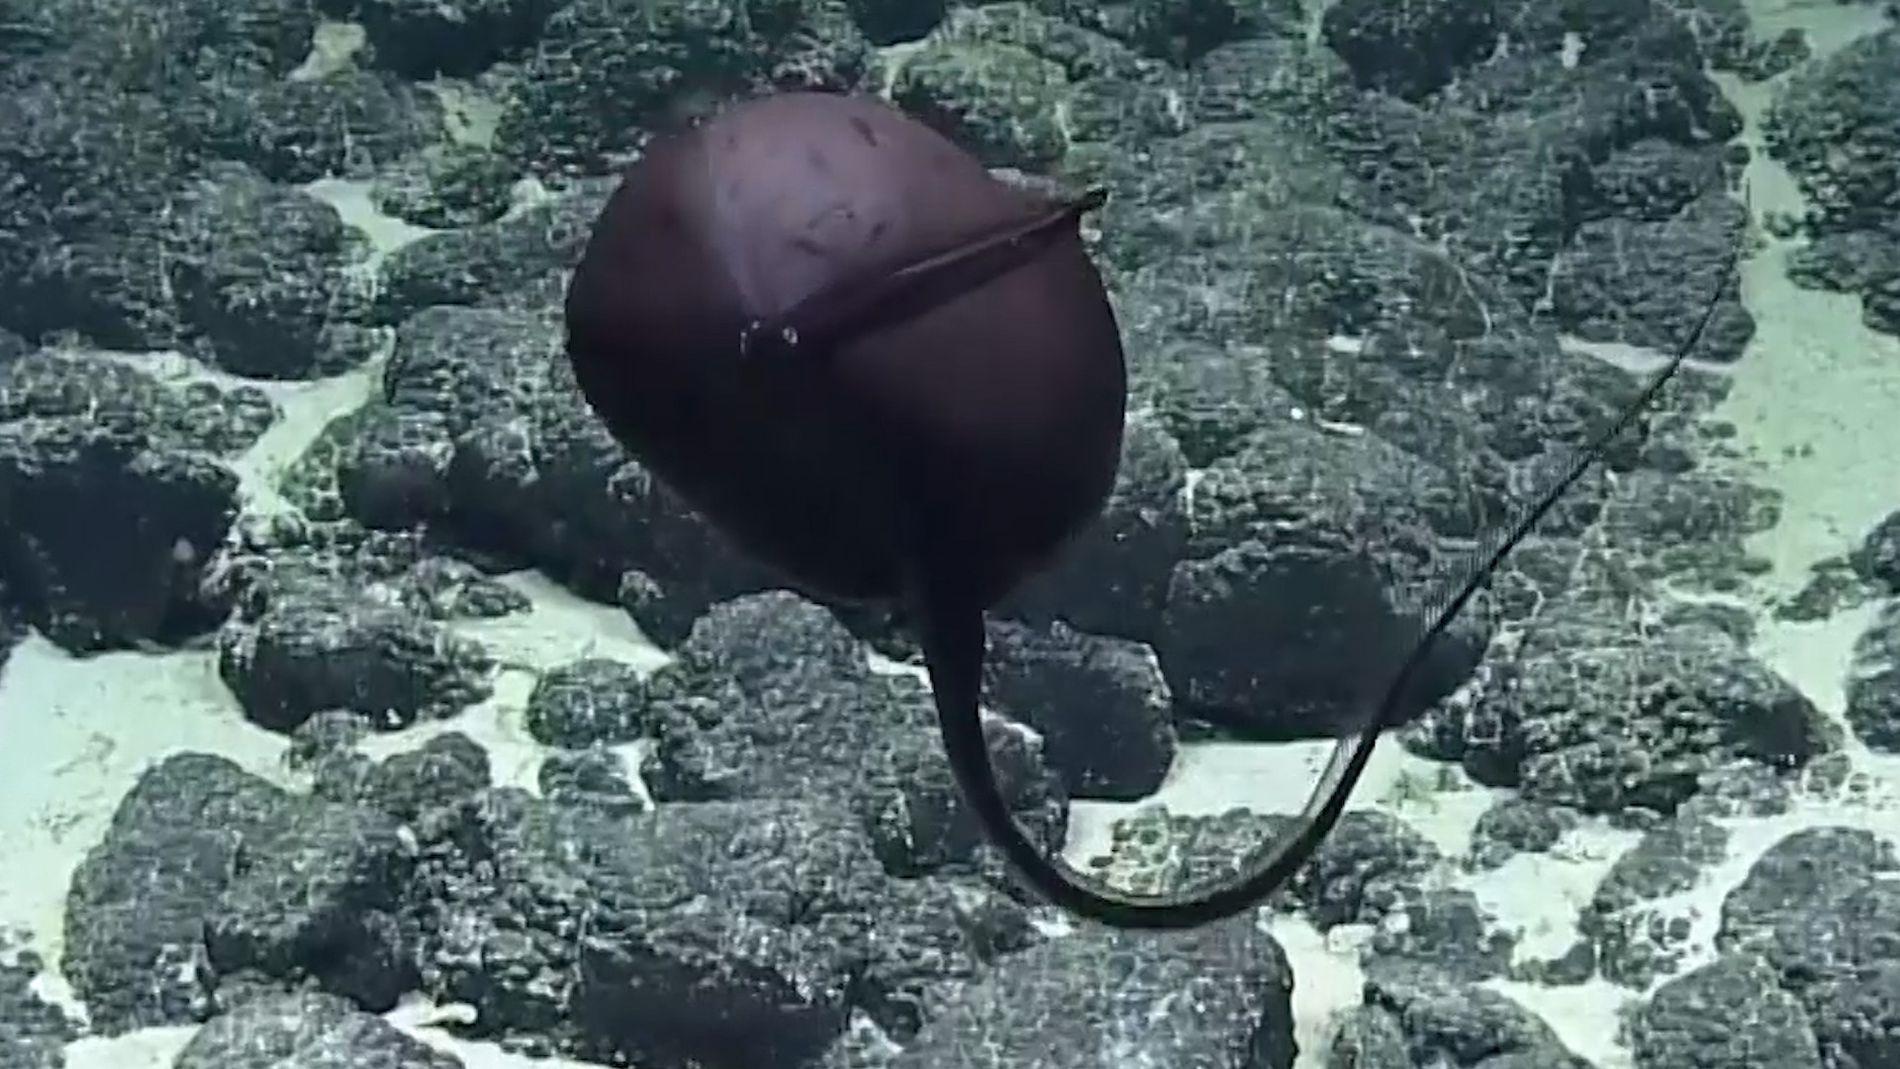 Scientists React to Bizarre Deep-Sea Fish